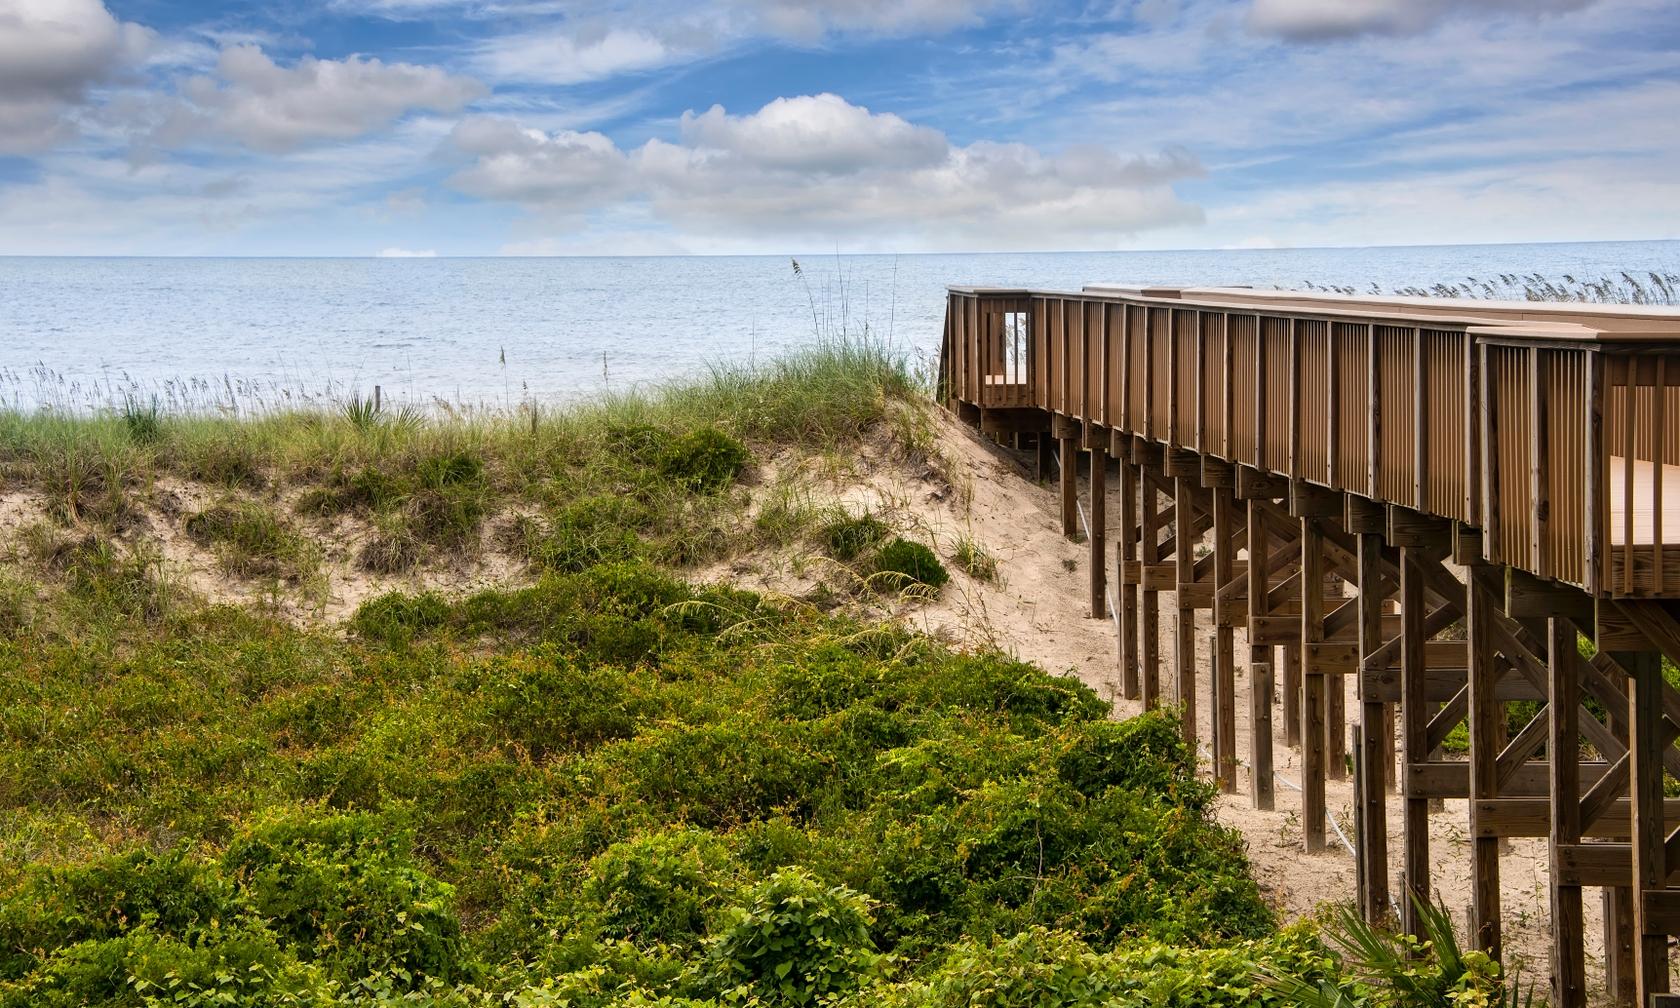 Vacation rentals in Fernandina Beach